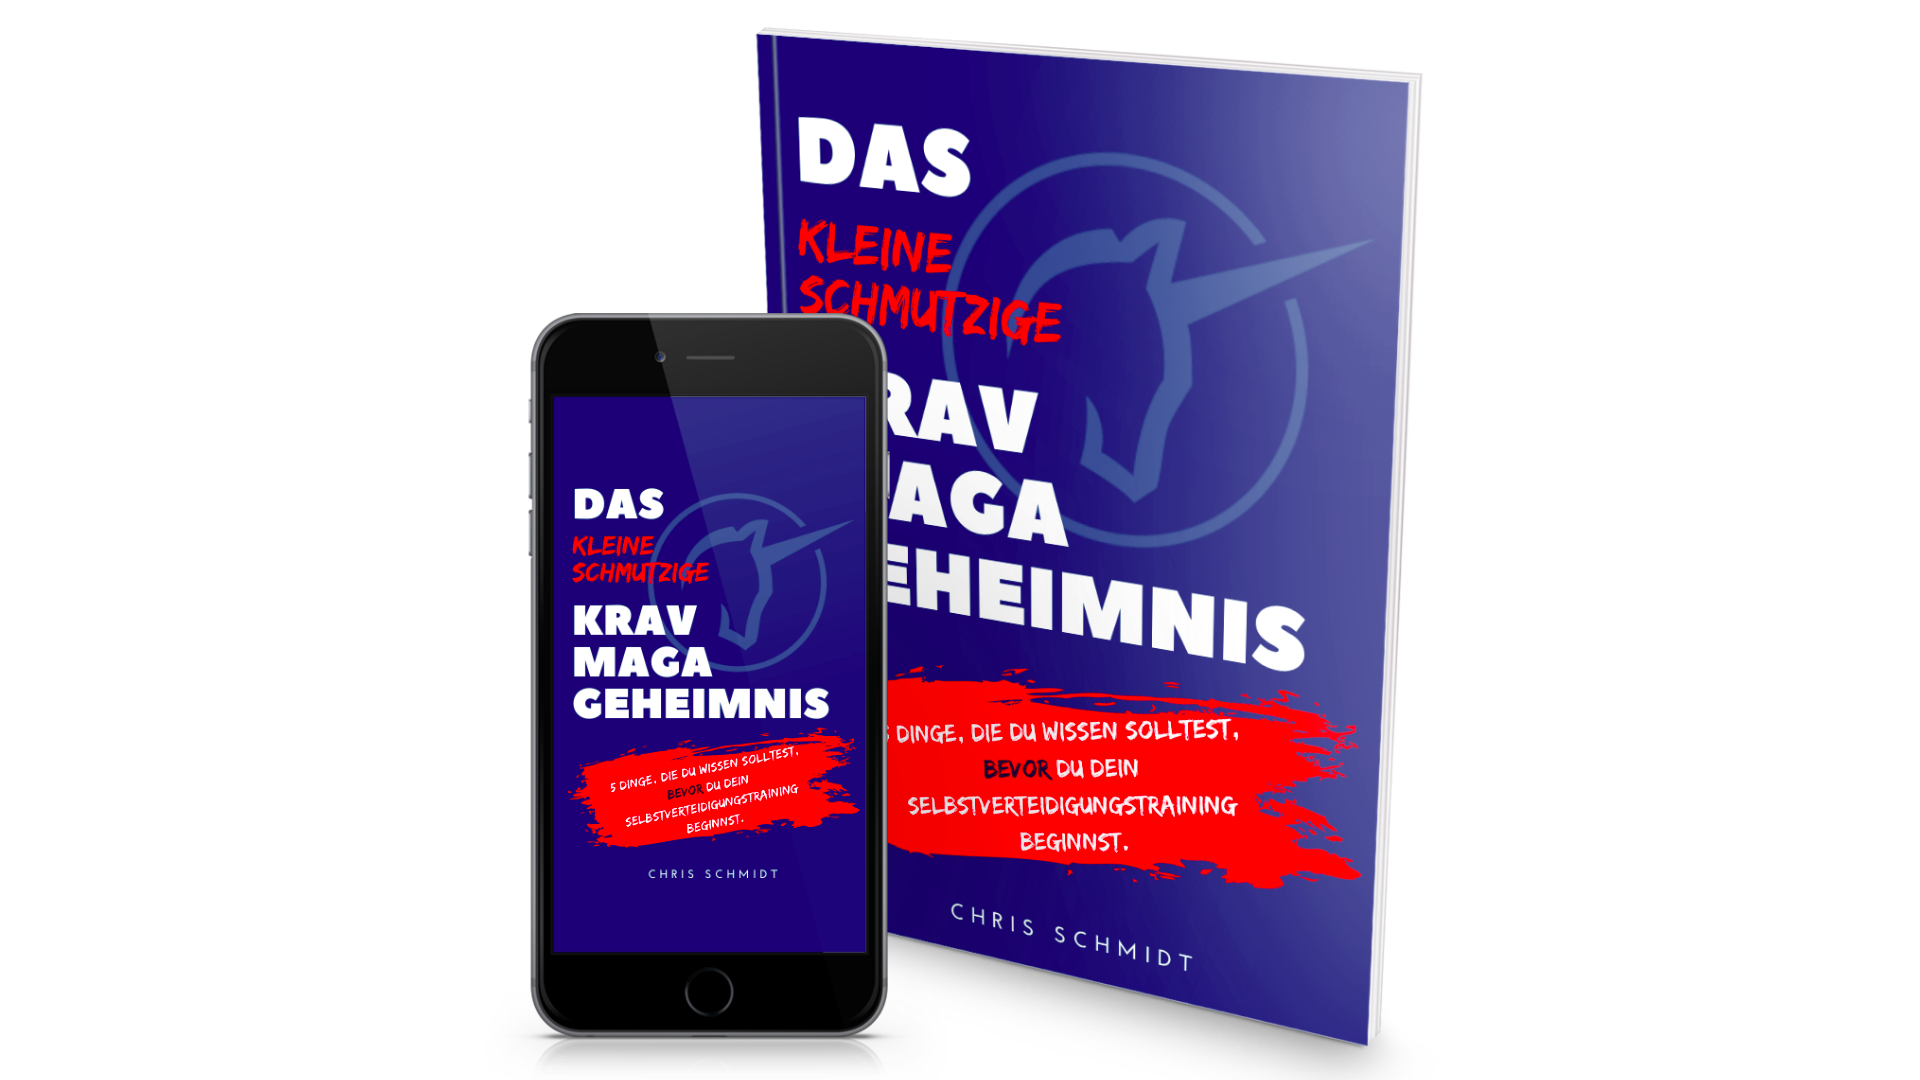 YOU CAN FIGHT Krav Maga Selbstverteidigung Das Krav Maga Geheimnis